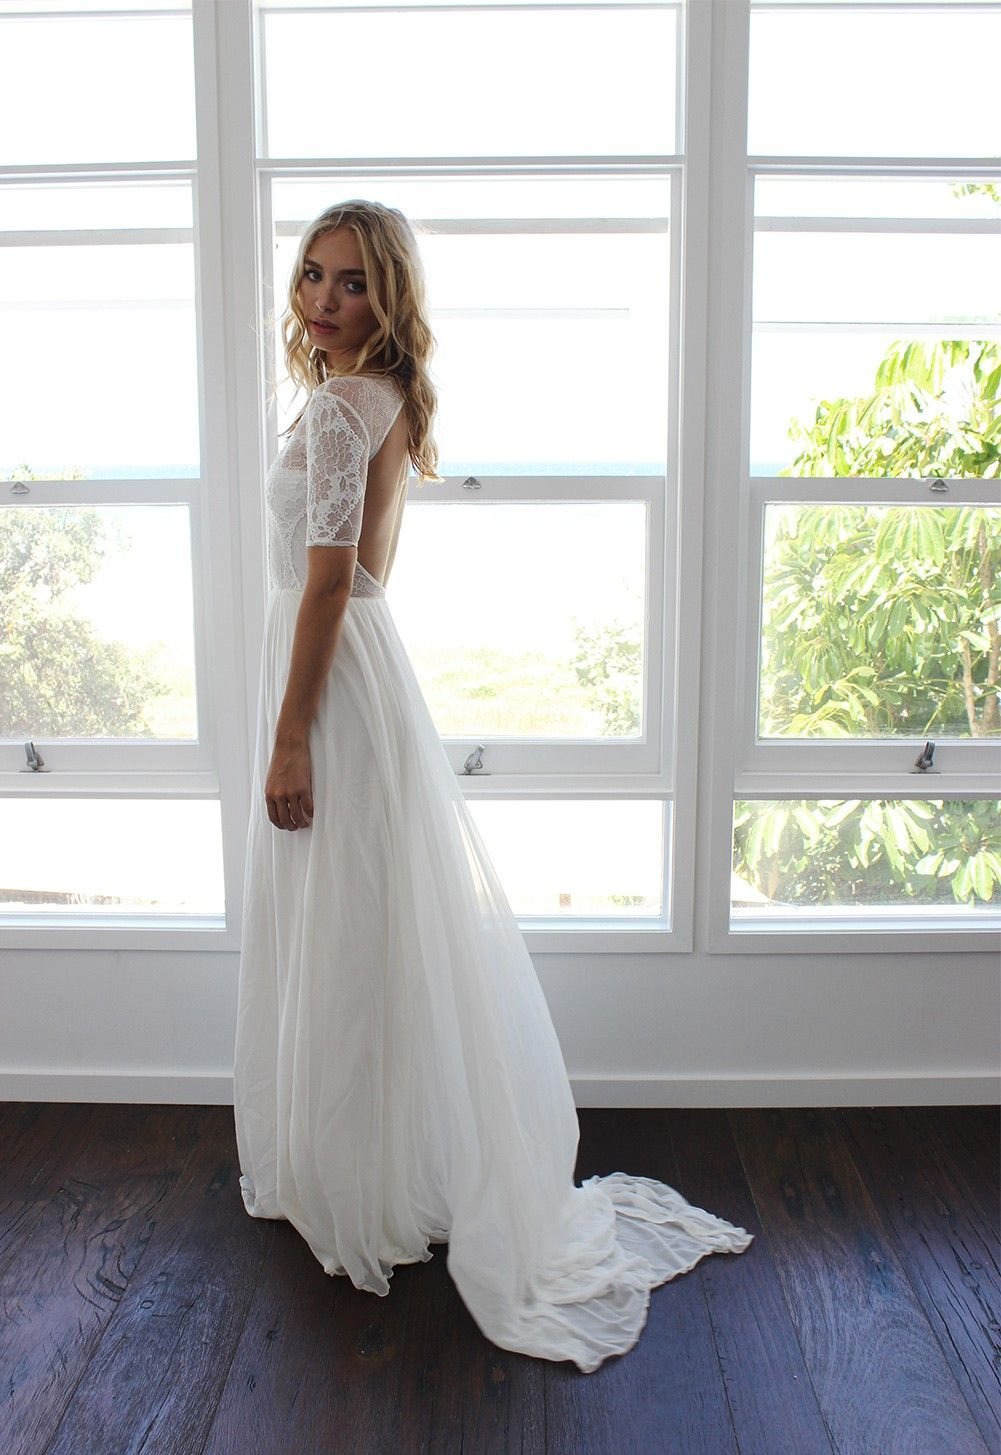 Venetian style bridesmaid dresses